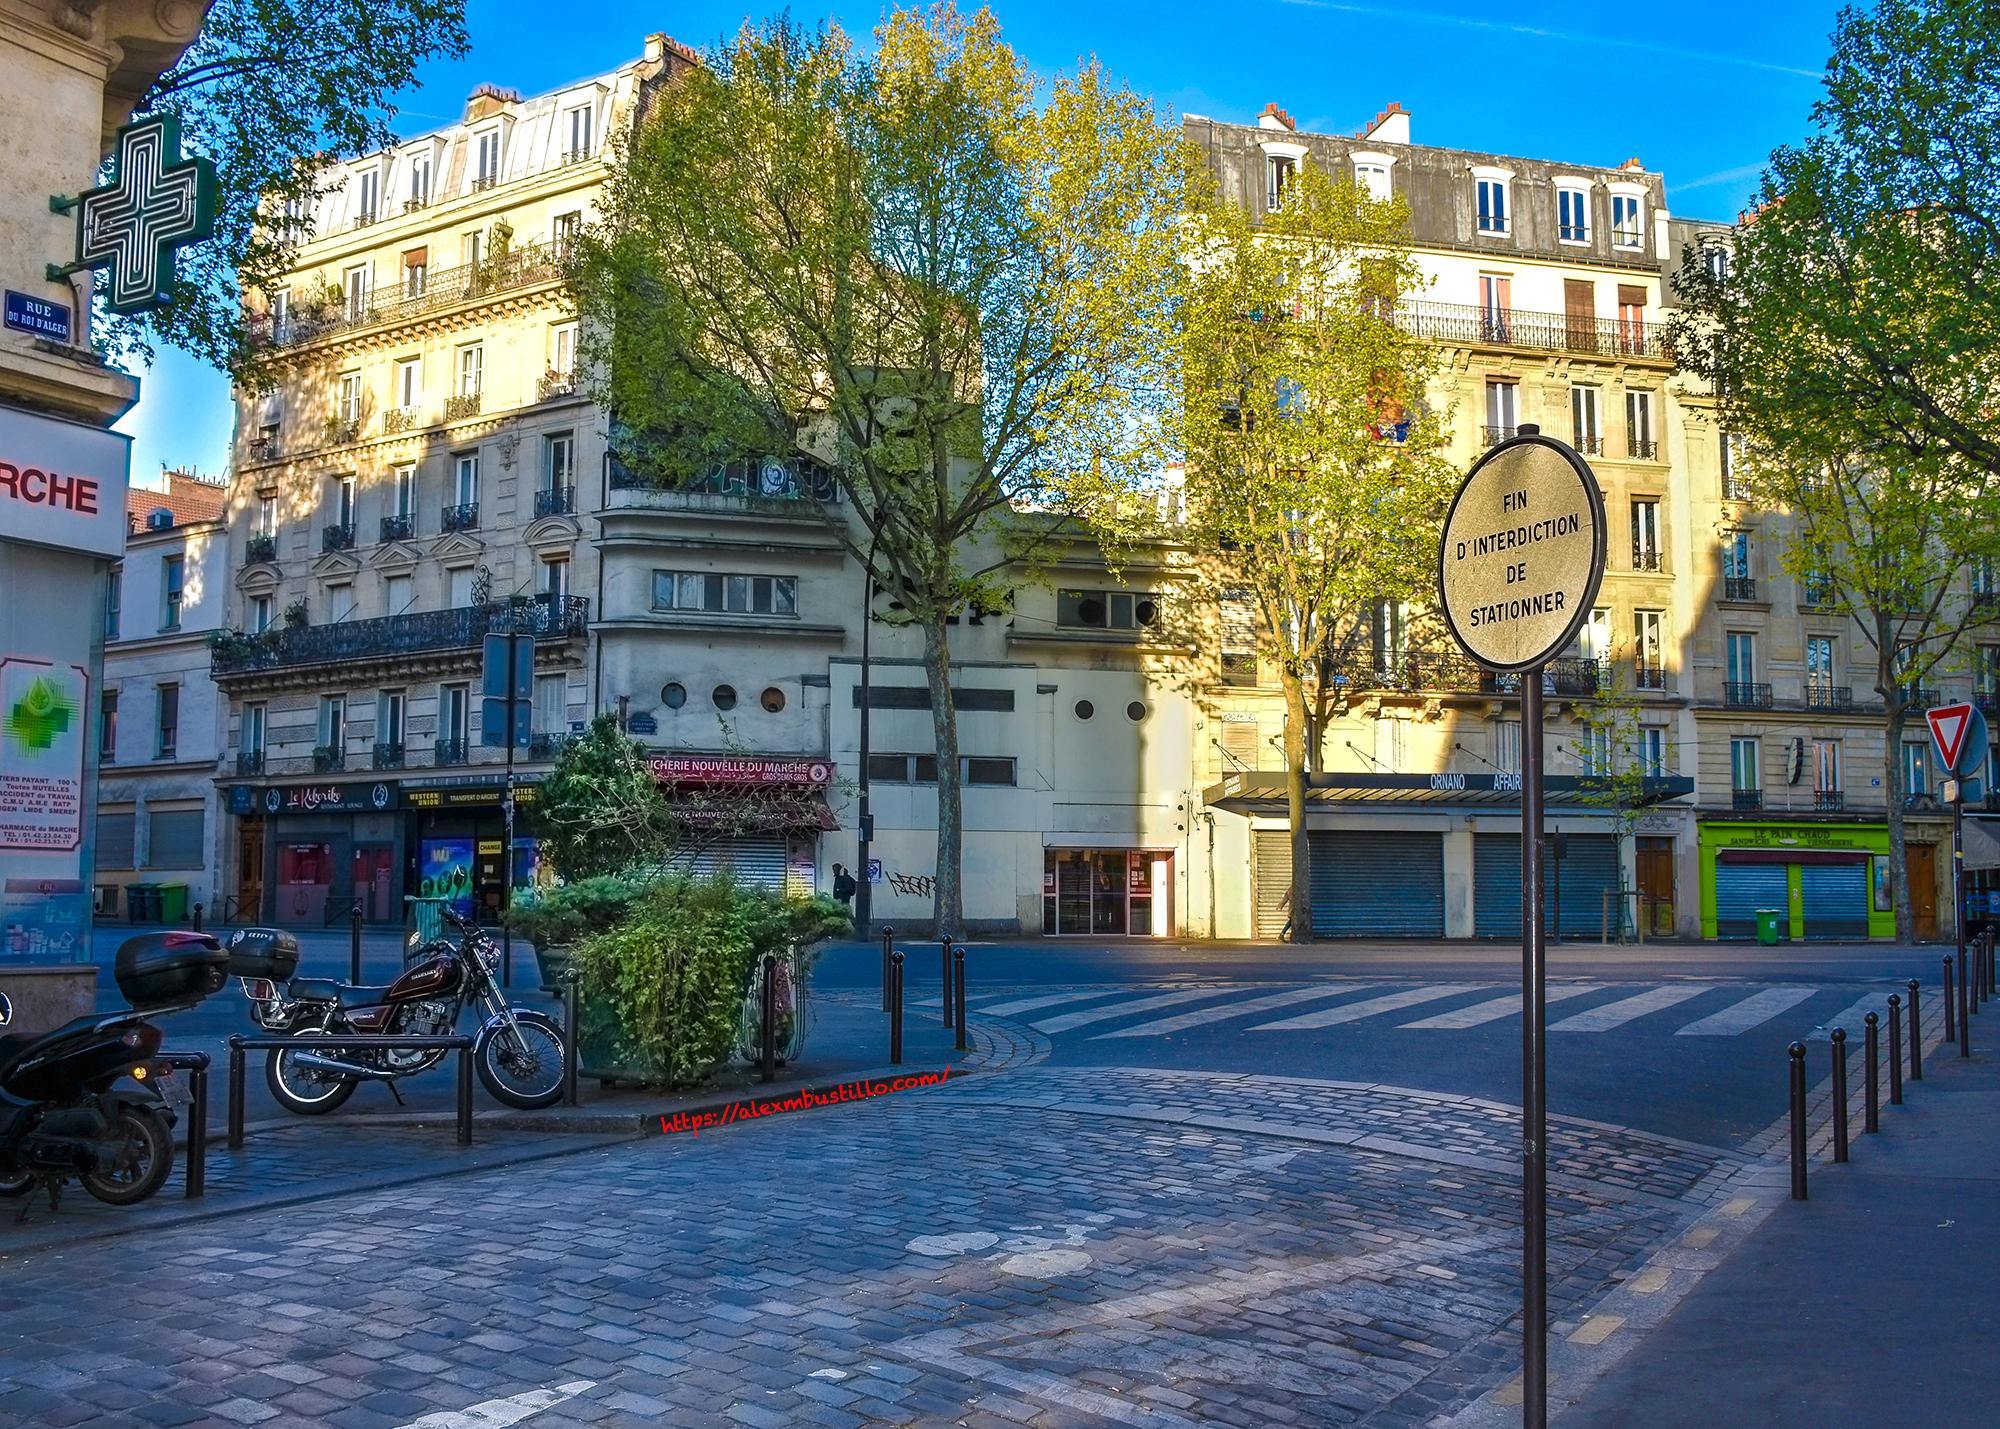 Rue Du Roi D'Alger @ Boulevard Ornano, 75018 Paris, France